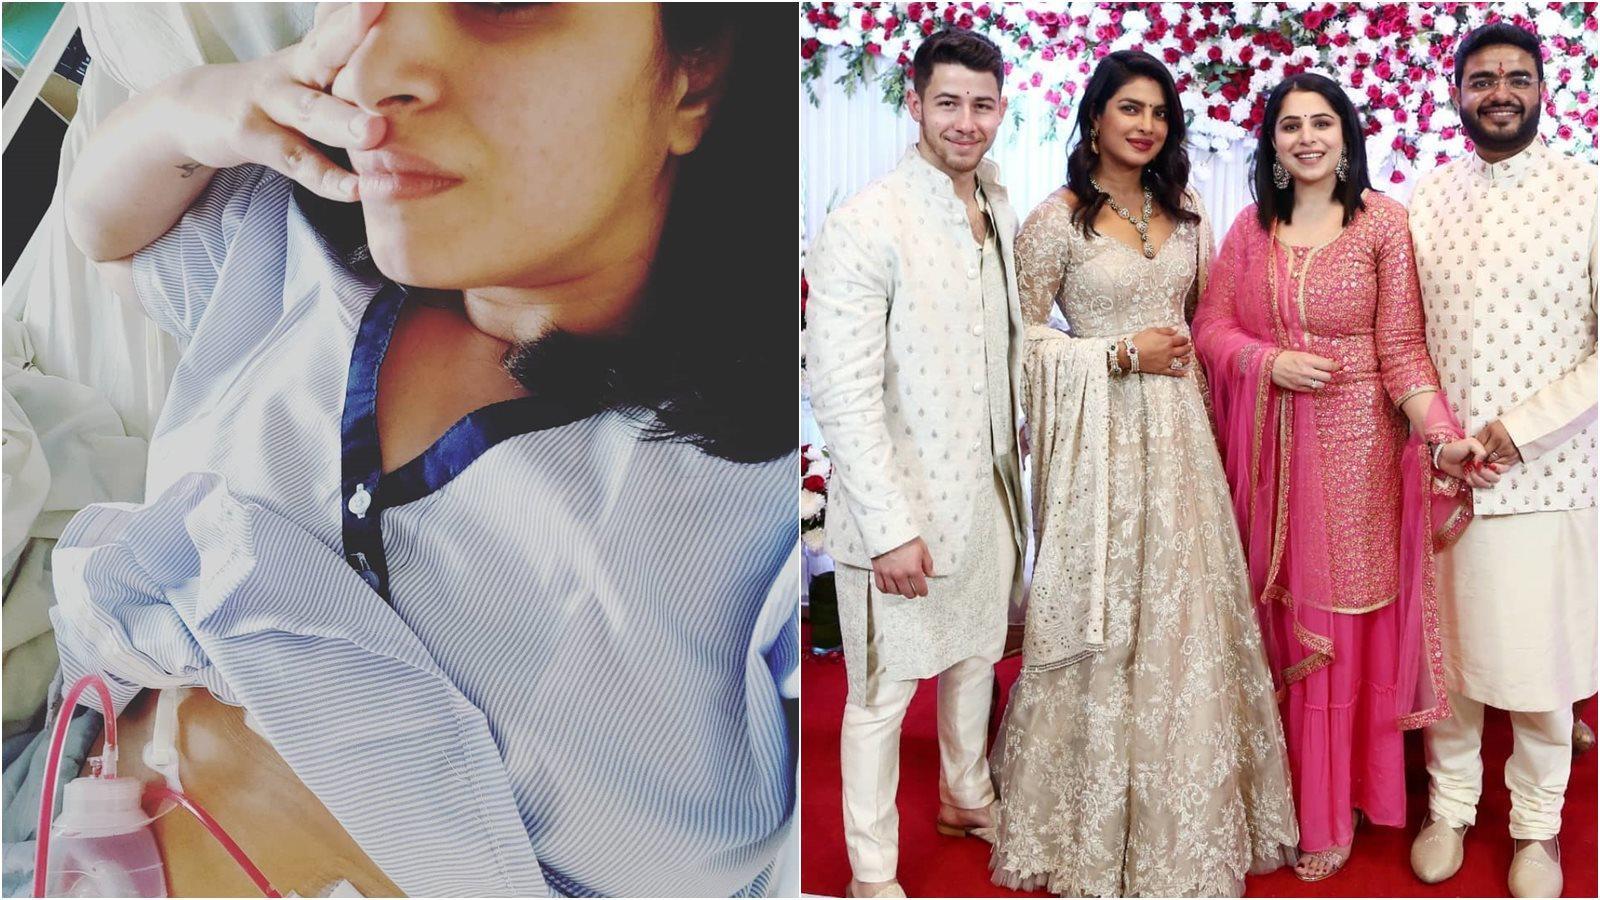 Priyanka Chopra Jonas' brother Siddharth's wedding postponed after  bride-to-be undergoes emergency surgery?